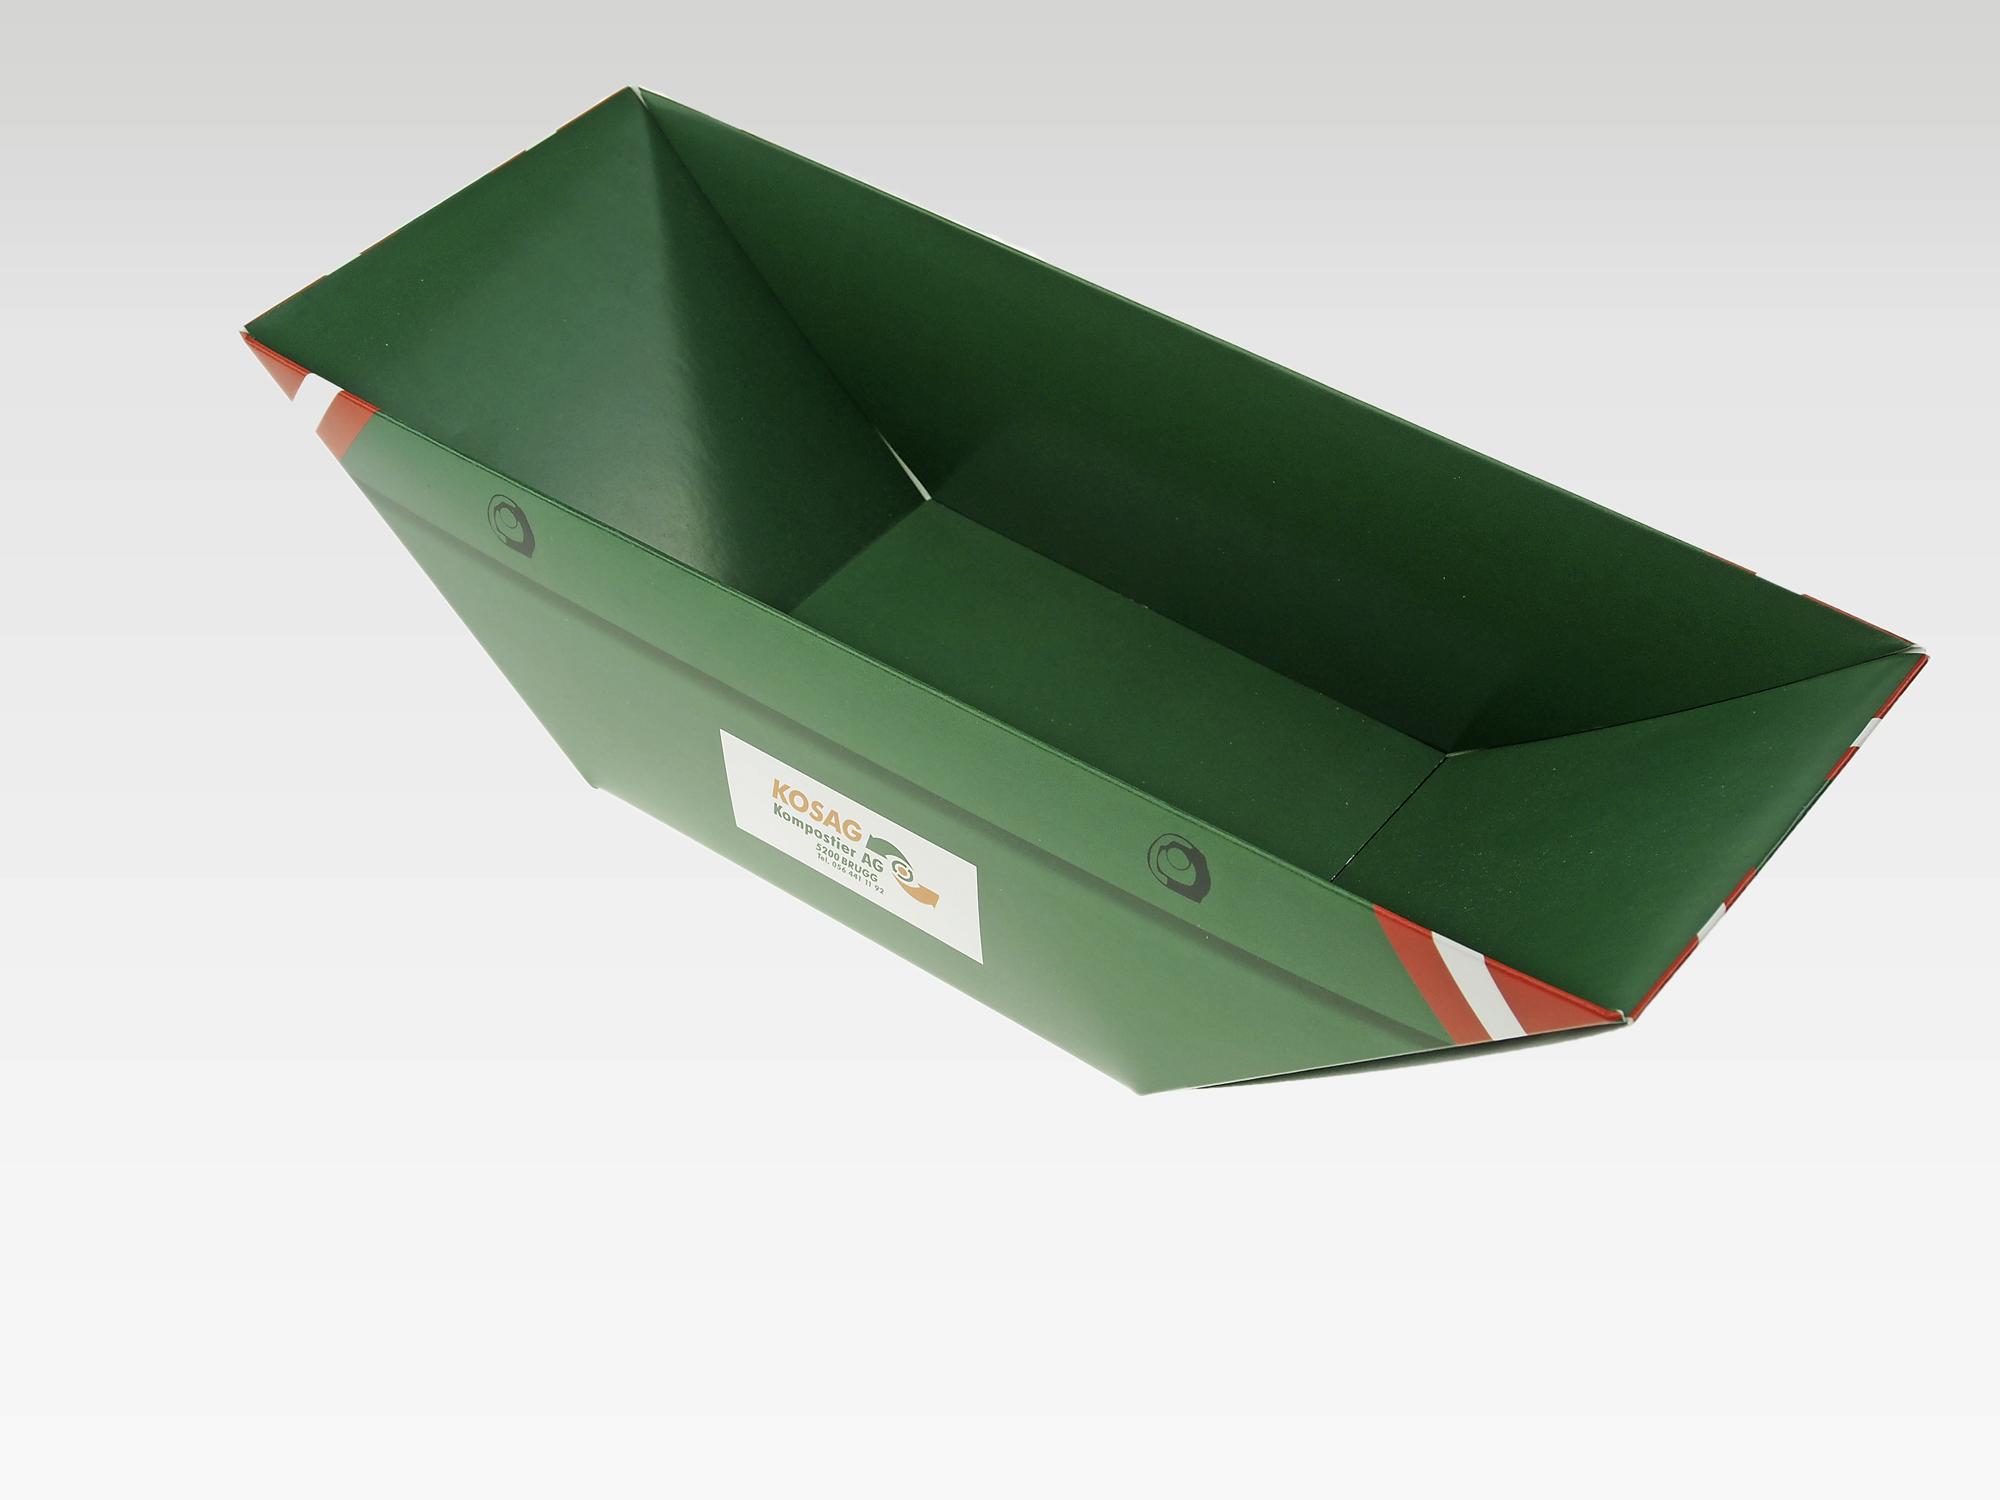 Produkteverpackungen_Mulde_2000px